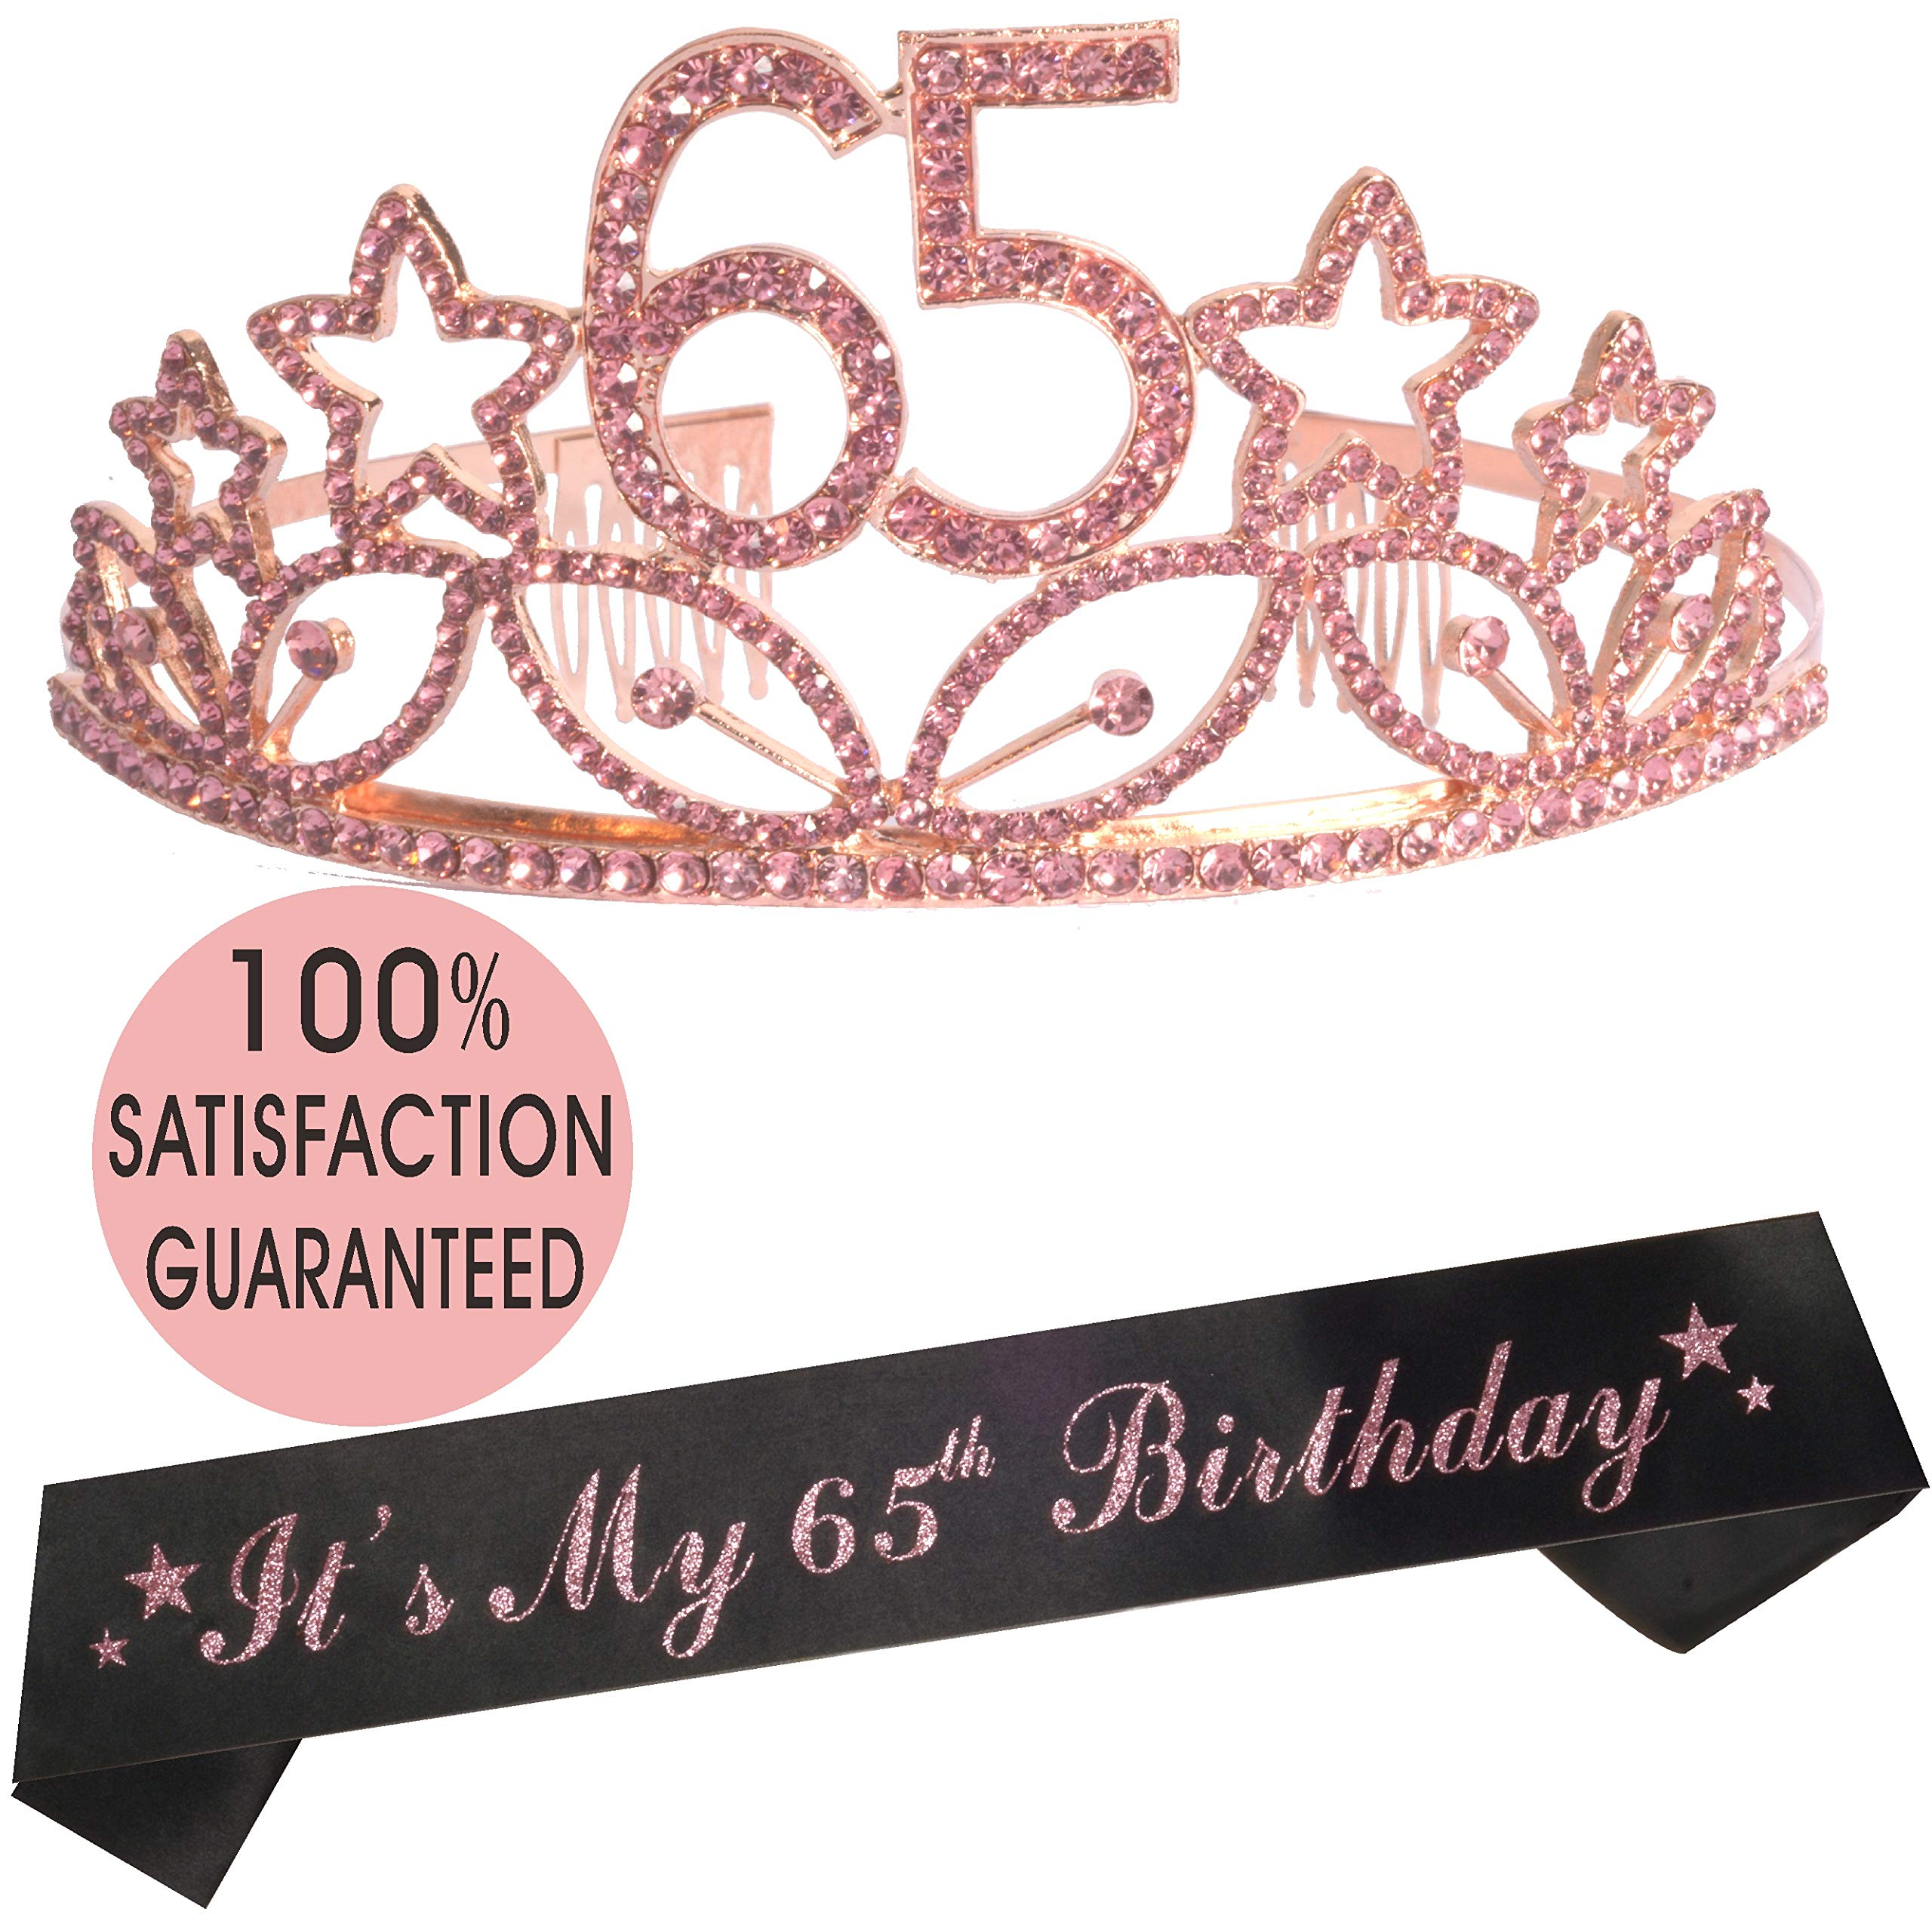 65th Birthday Tiara and Sash, HAPPY 65th Birthday Party Supplies, 65th Glitter Satin Sash and Crystal Tiara Birthday Crown for 65th Birthday Party Supplies and Decorations (Tiara+Sash) (Pink)